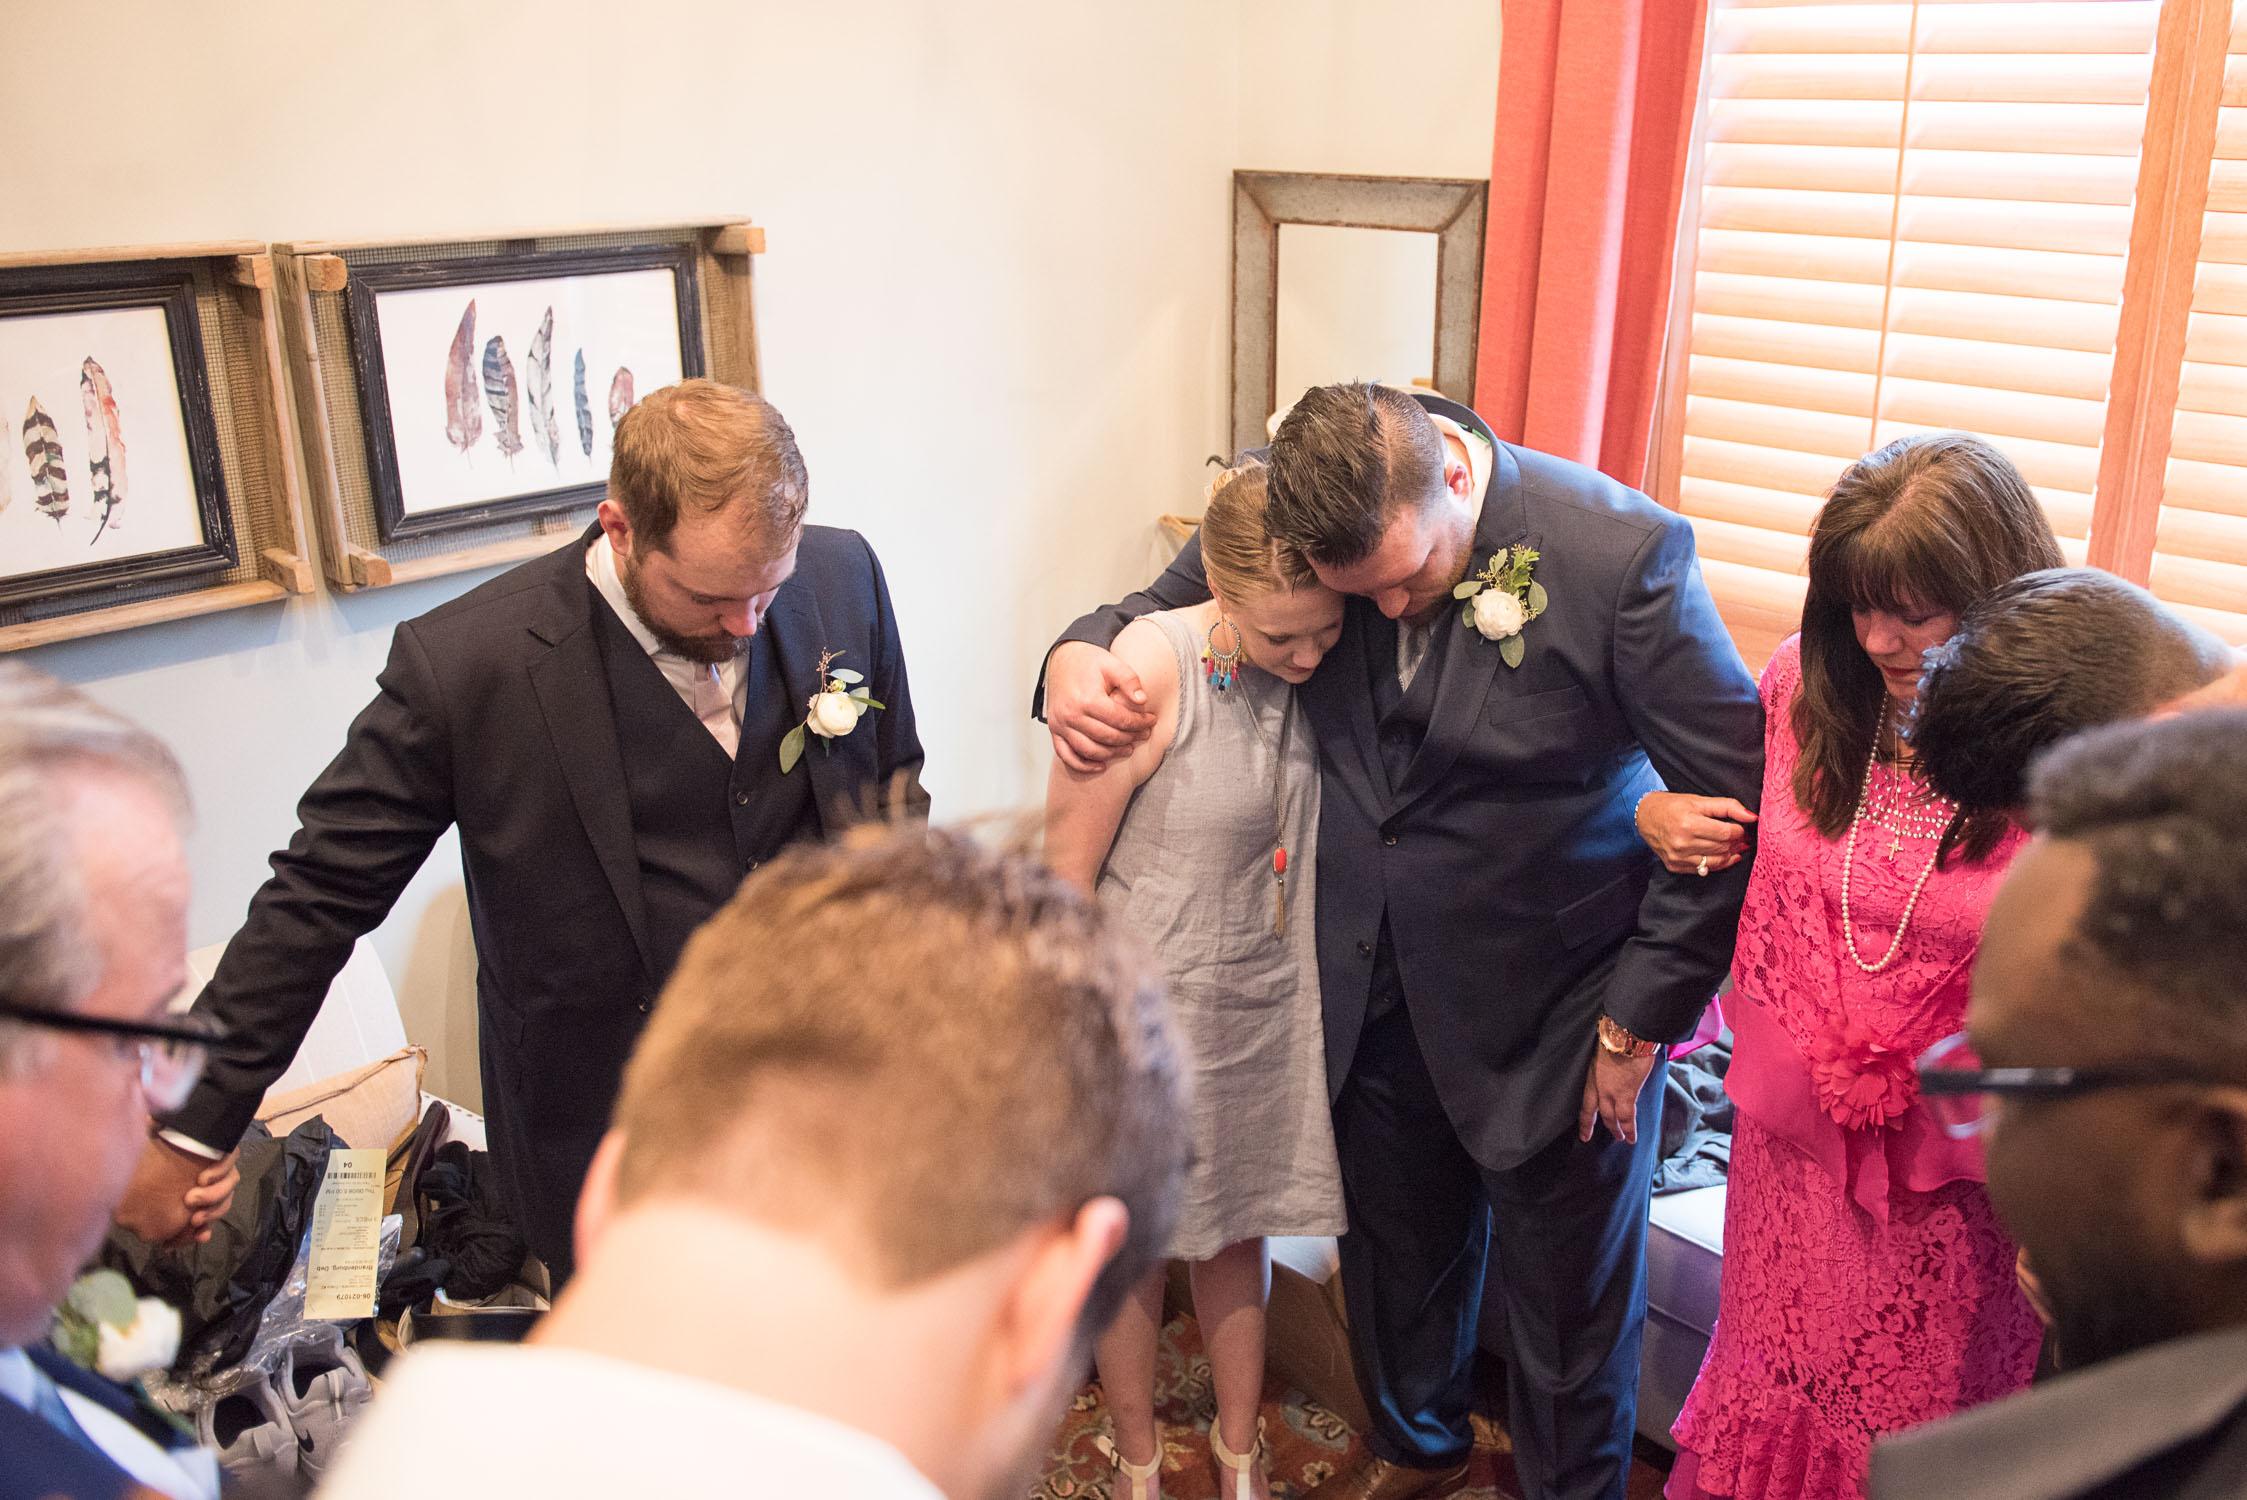 Hinton Wedding at Canyonwood Ridge Dripping Springs Texas Wedding Photography-101.jpg